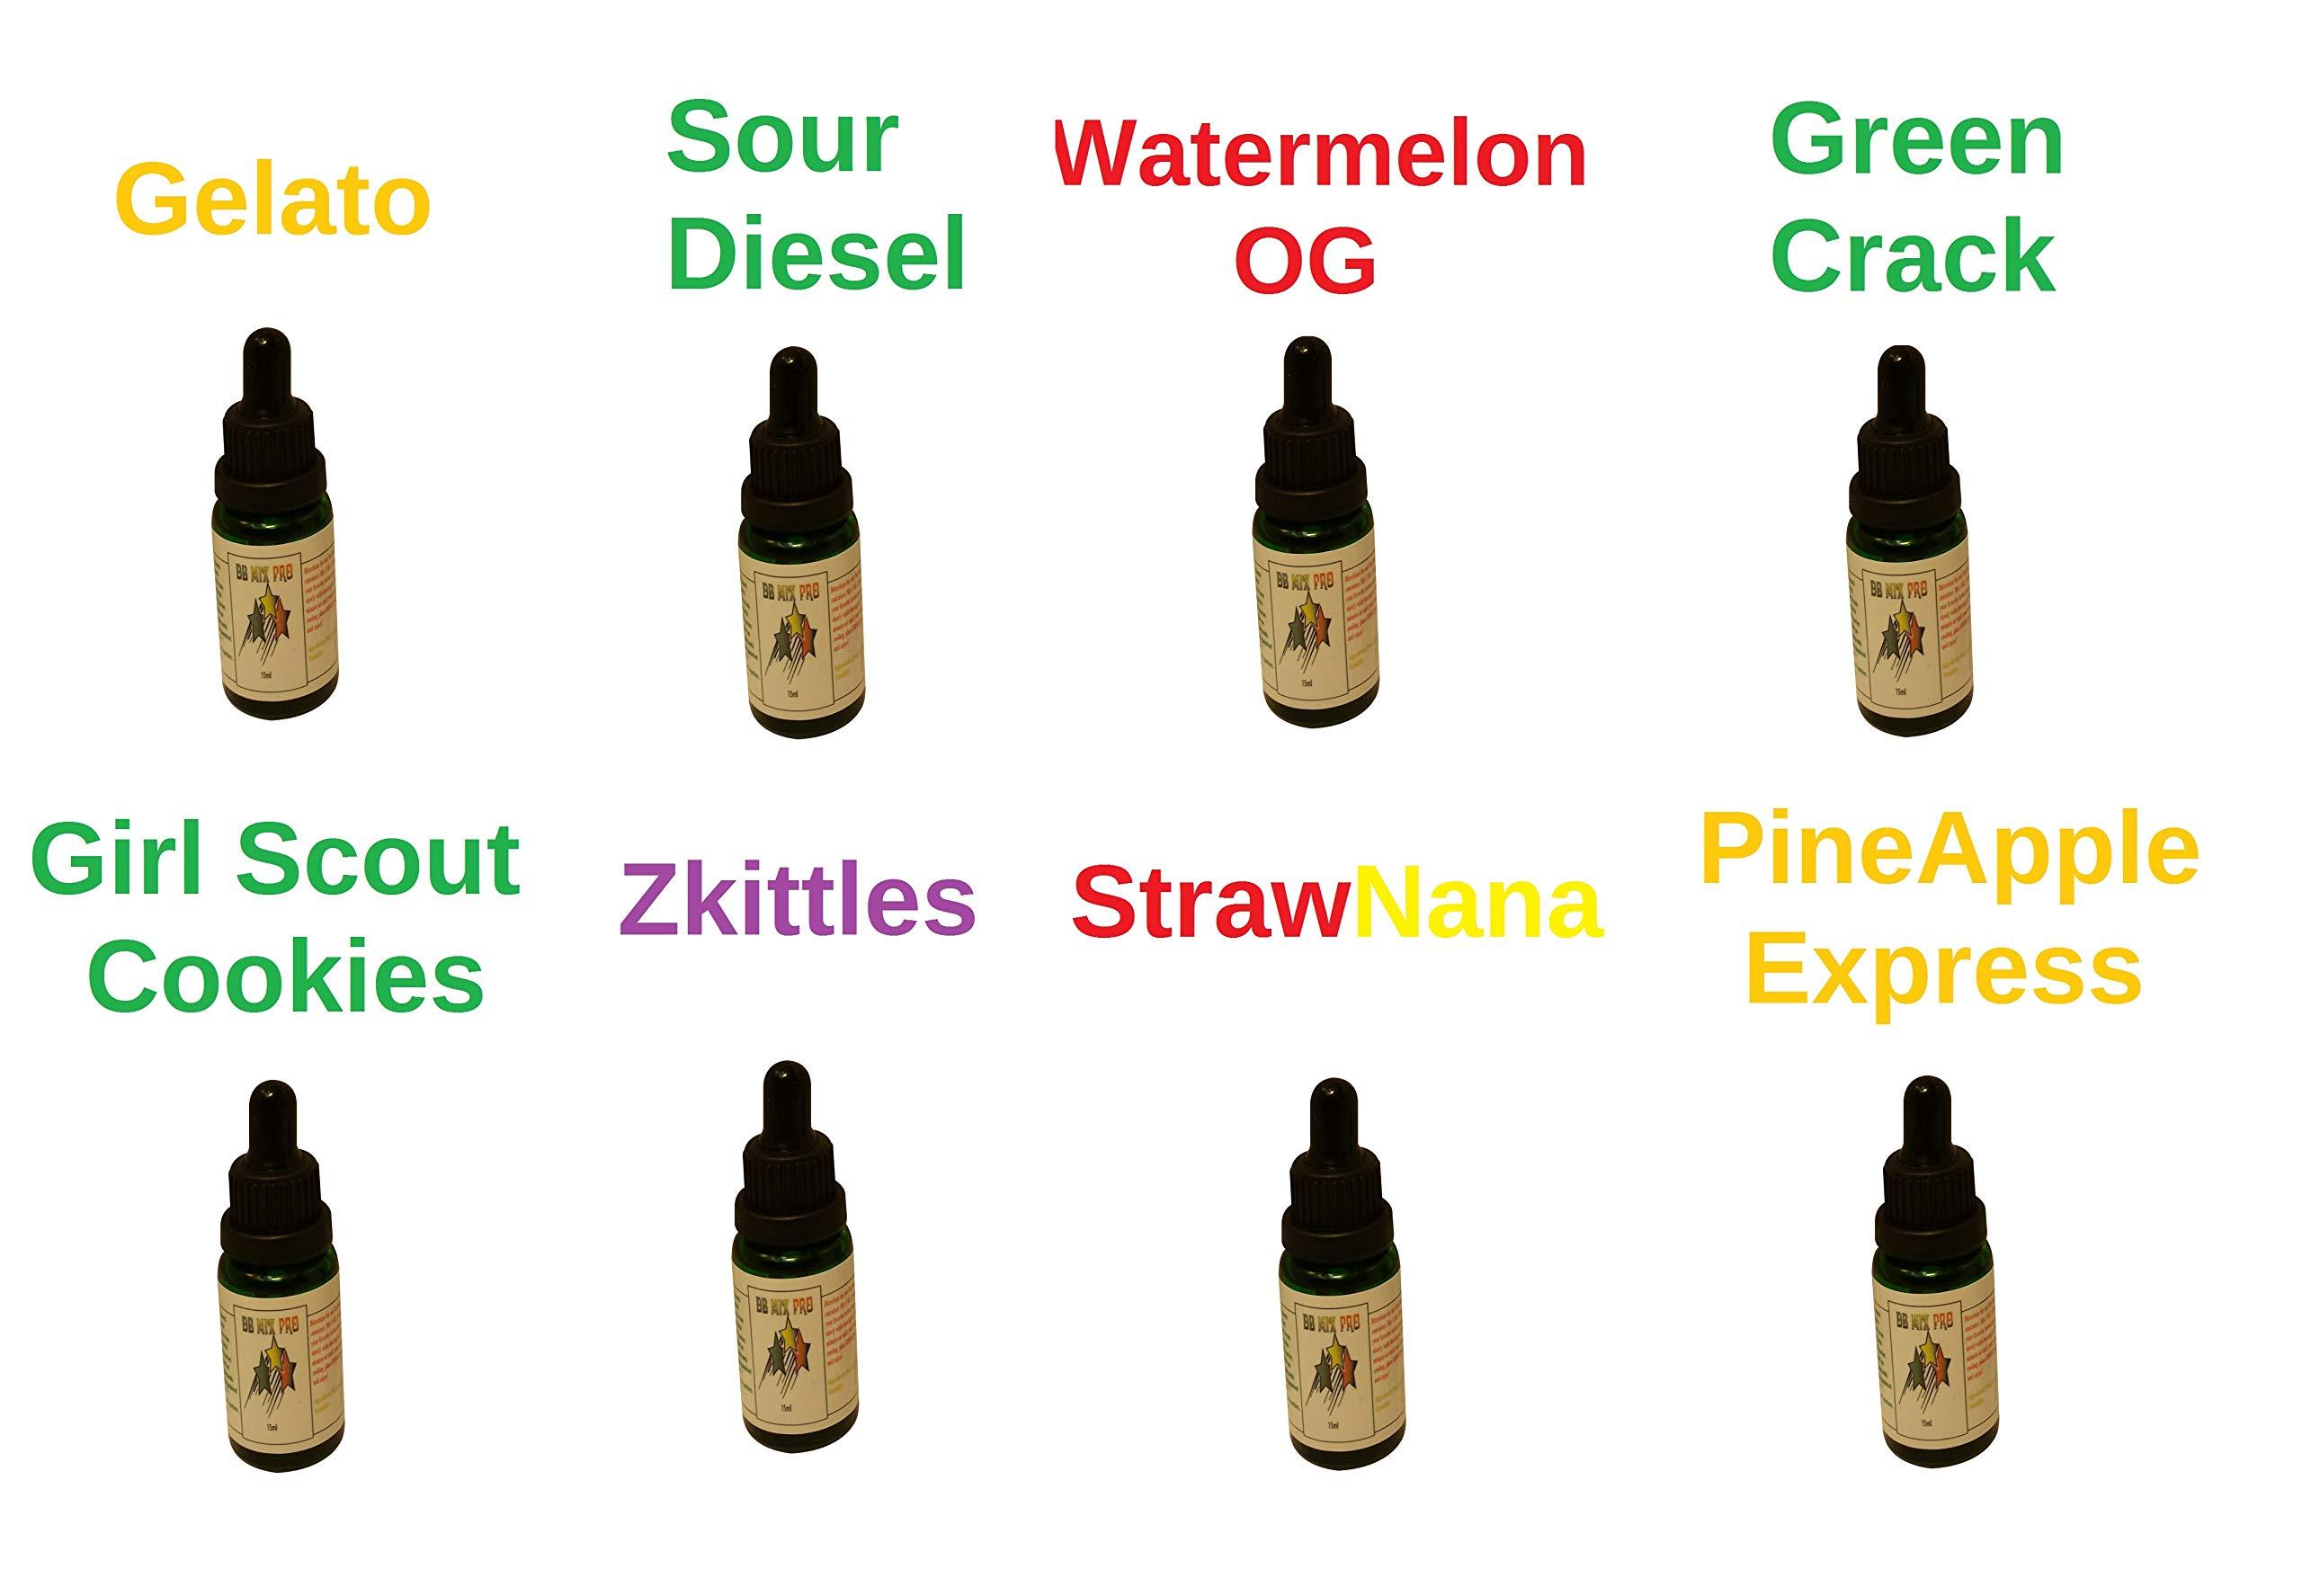 8 Pack of 15ml Bottles Terpene Infused Liquidizer 99% Pure Colorado Terpenes Strain Profiles by DJDesigns